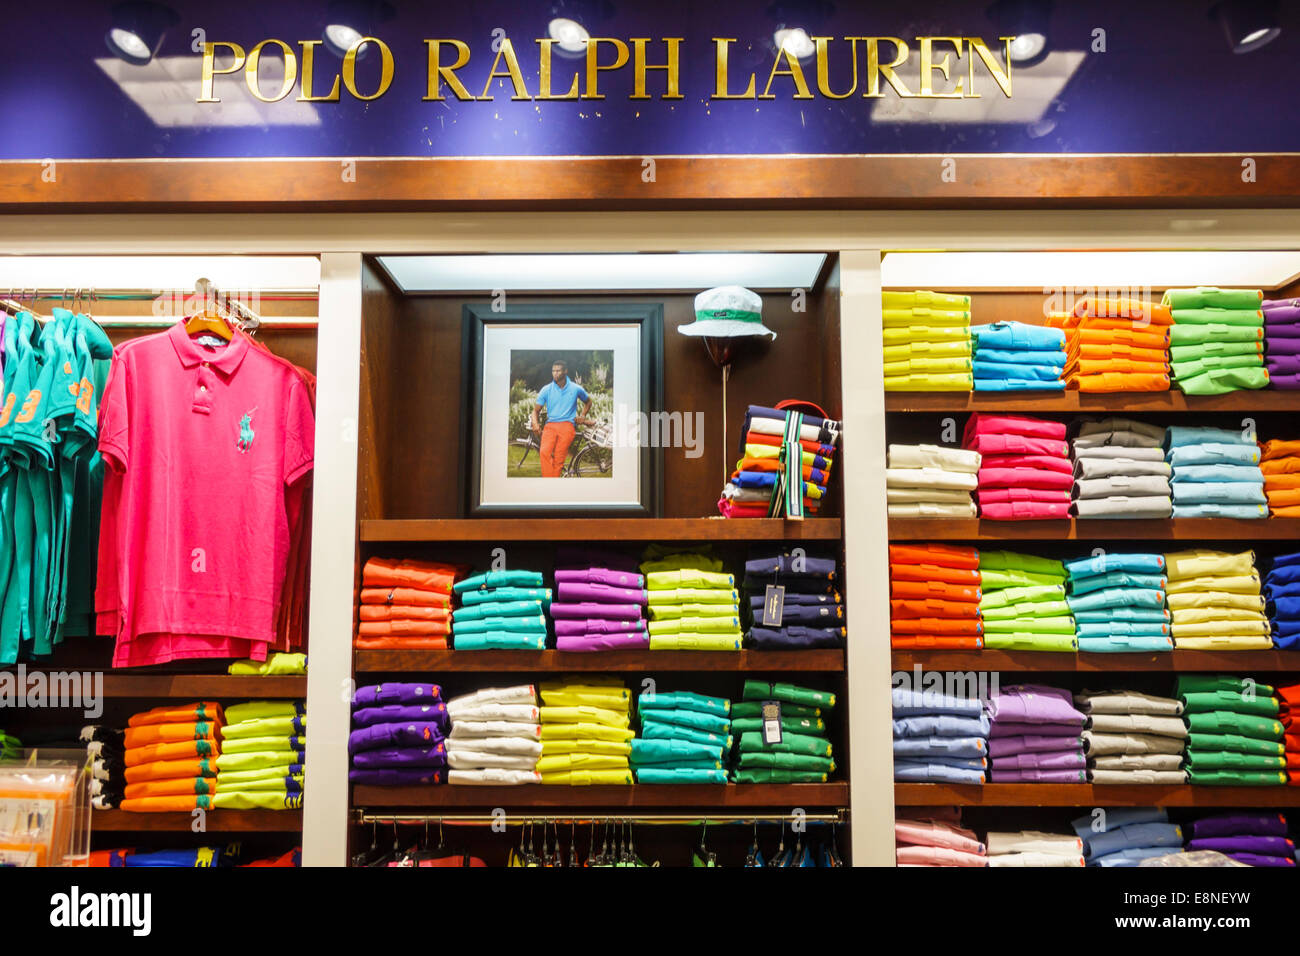 Boca Raton Florida Town Center at Boca Raton centre Bloomingdale's department store shopping men's clothing - Stock Image